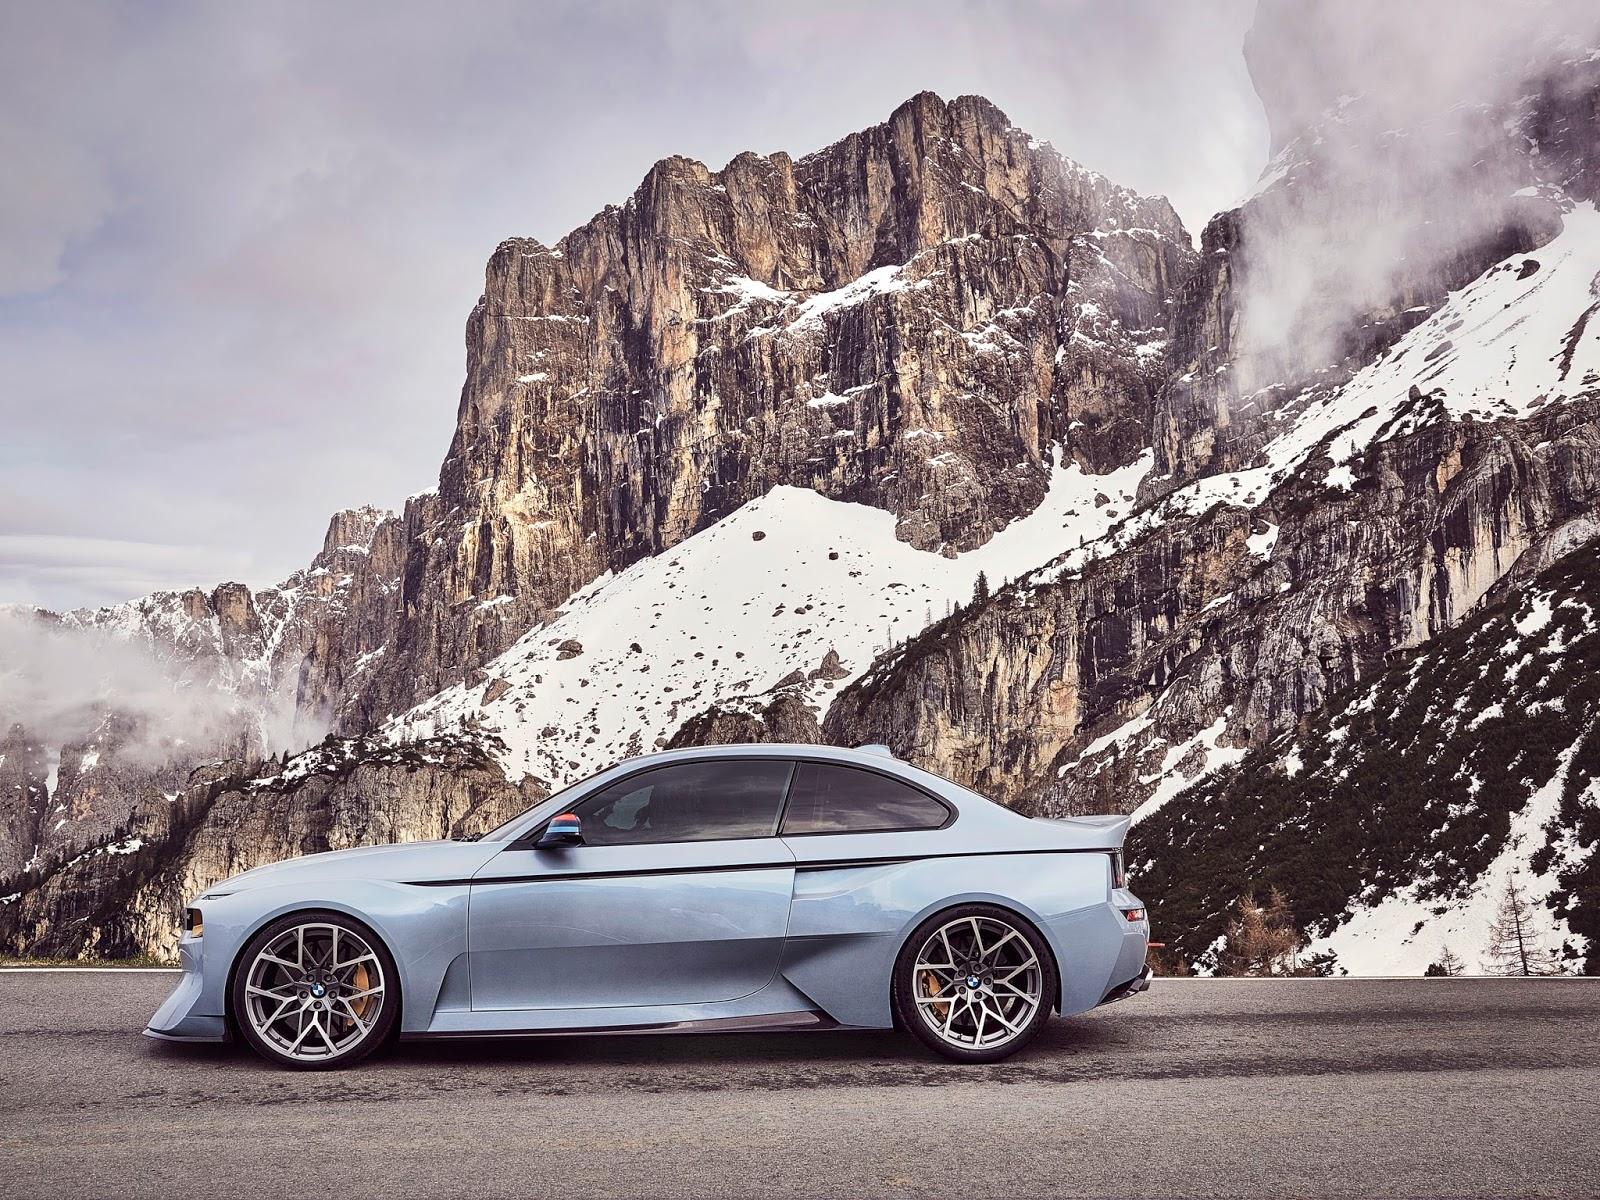 P90219716 highRes bmw 2002 hommage 05 1 1 H BMW γιορτάζει τα 50 χρόνια της θρυλικής 2002 turbo και παρουσιάζει την Bmw 2002 Hommage BMW, BMW 2002, BMW 2002 turbo, BMW Concept, BMW Hommage, supercars, videos